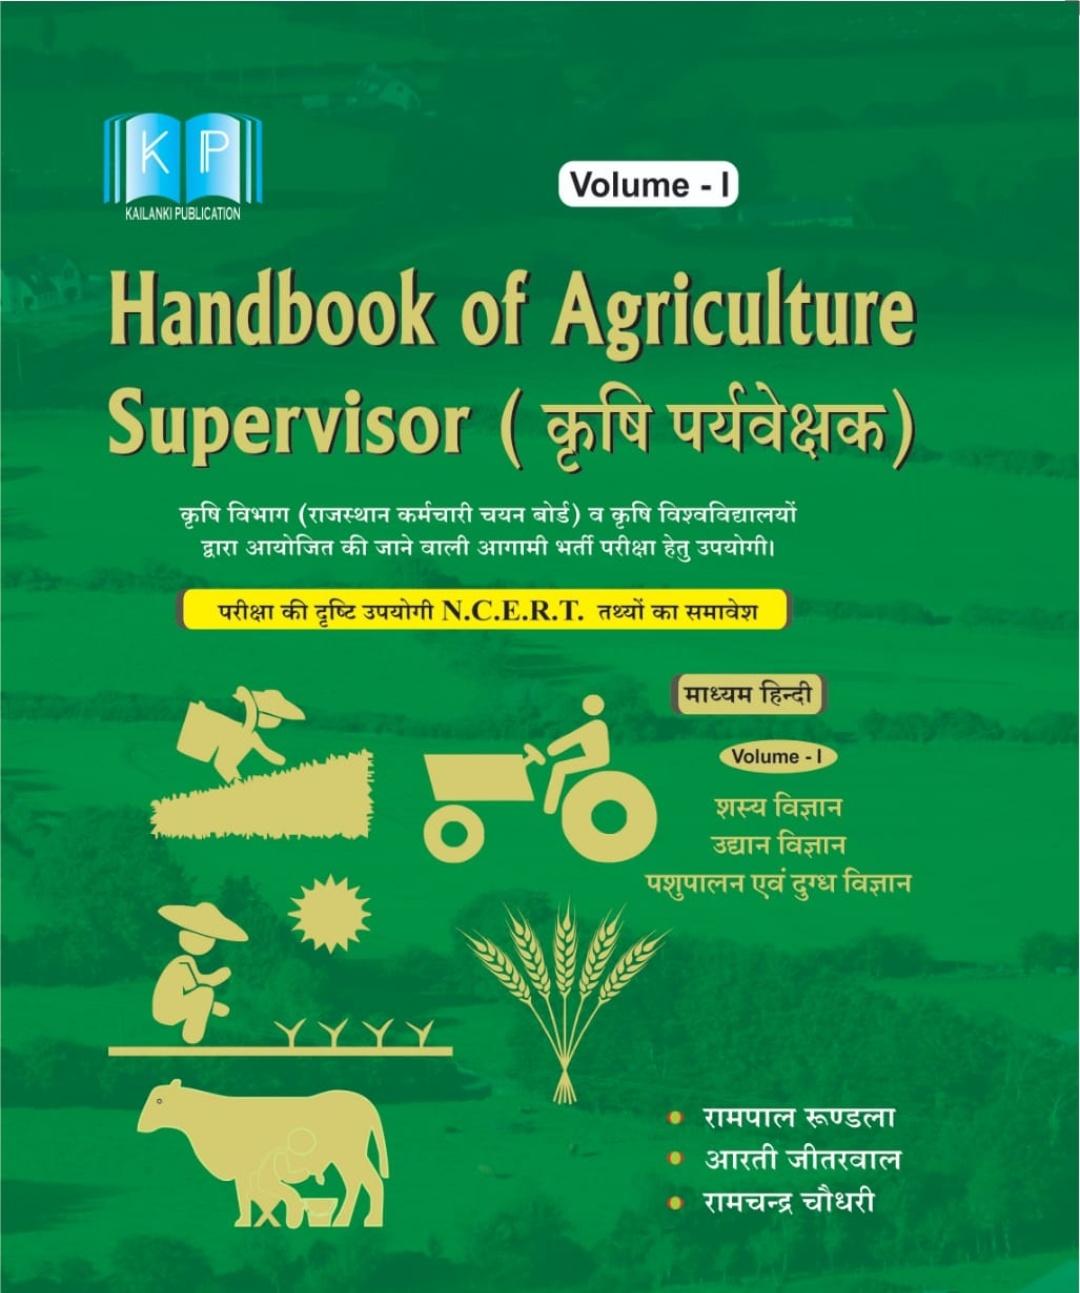 KP Handbook Of Agriculture Supervisor vol 1st by Aarti Jiterwal Ramchandra Choudhary  Rampal Rundala